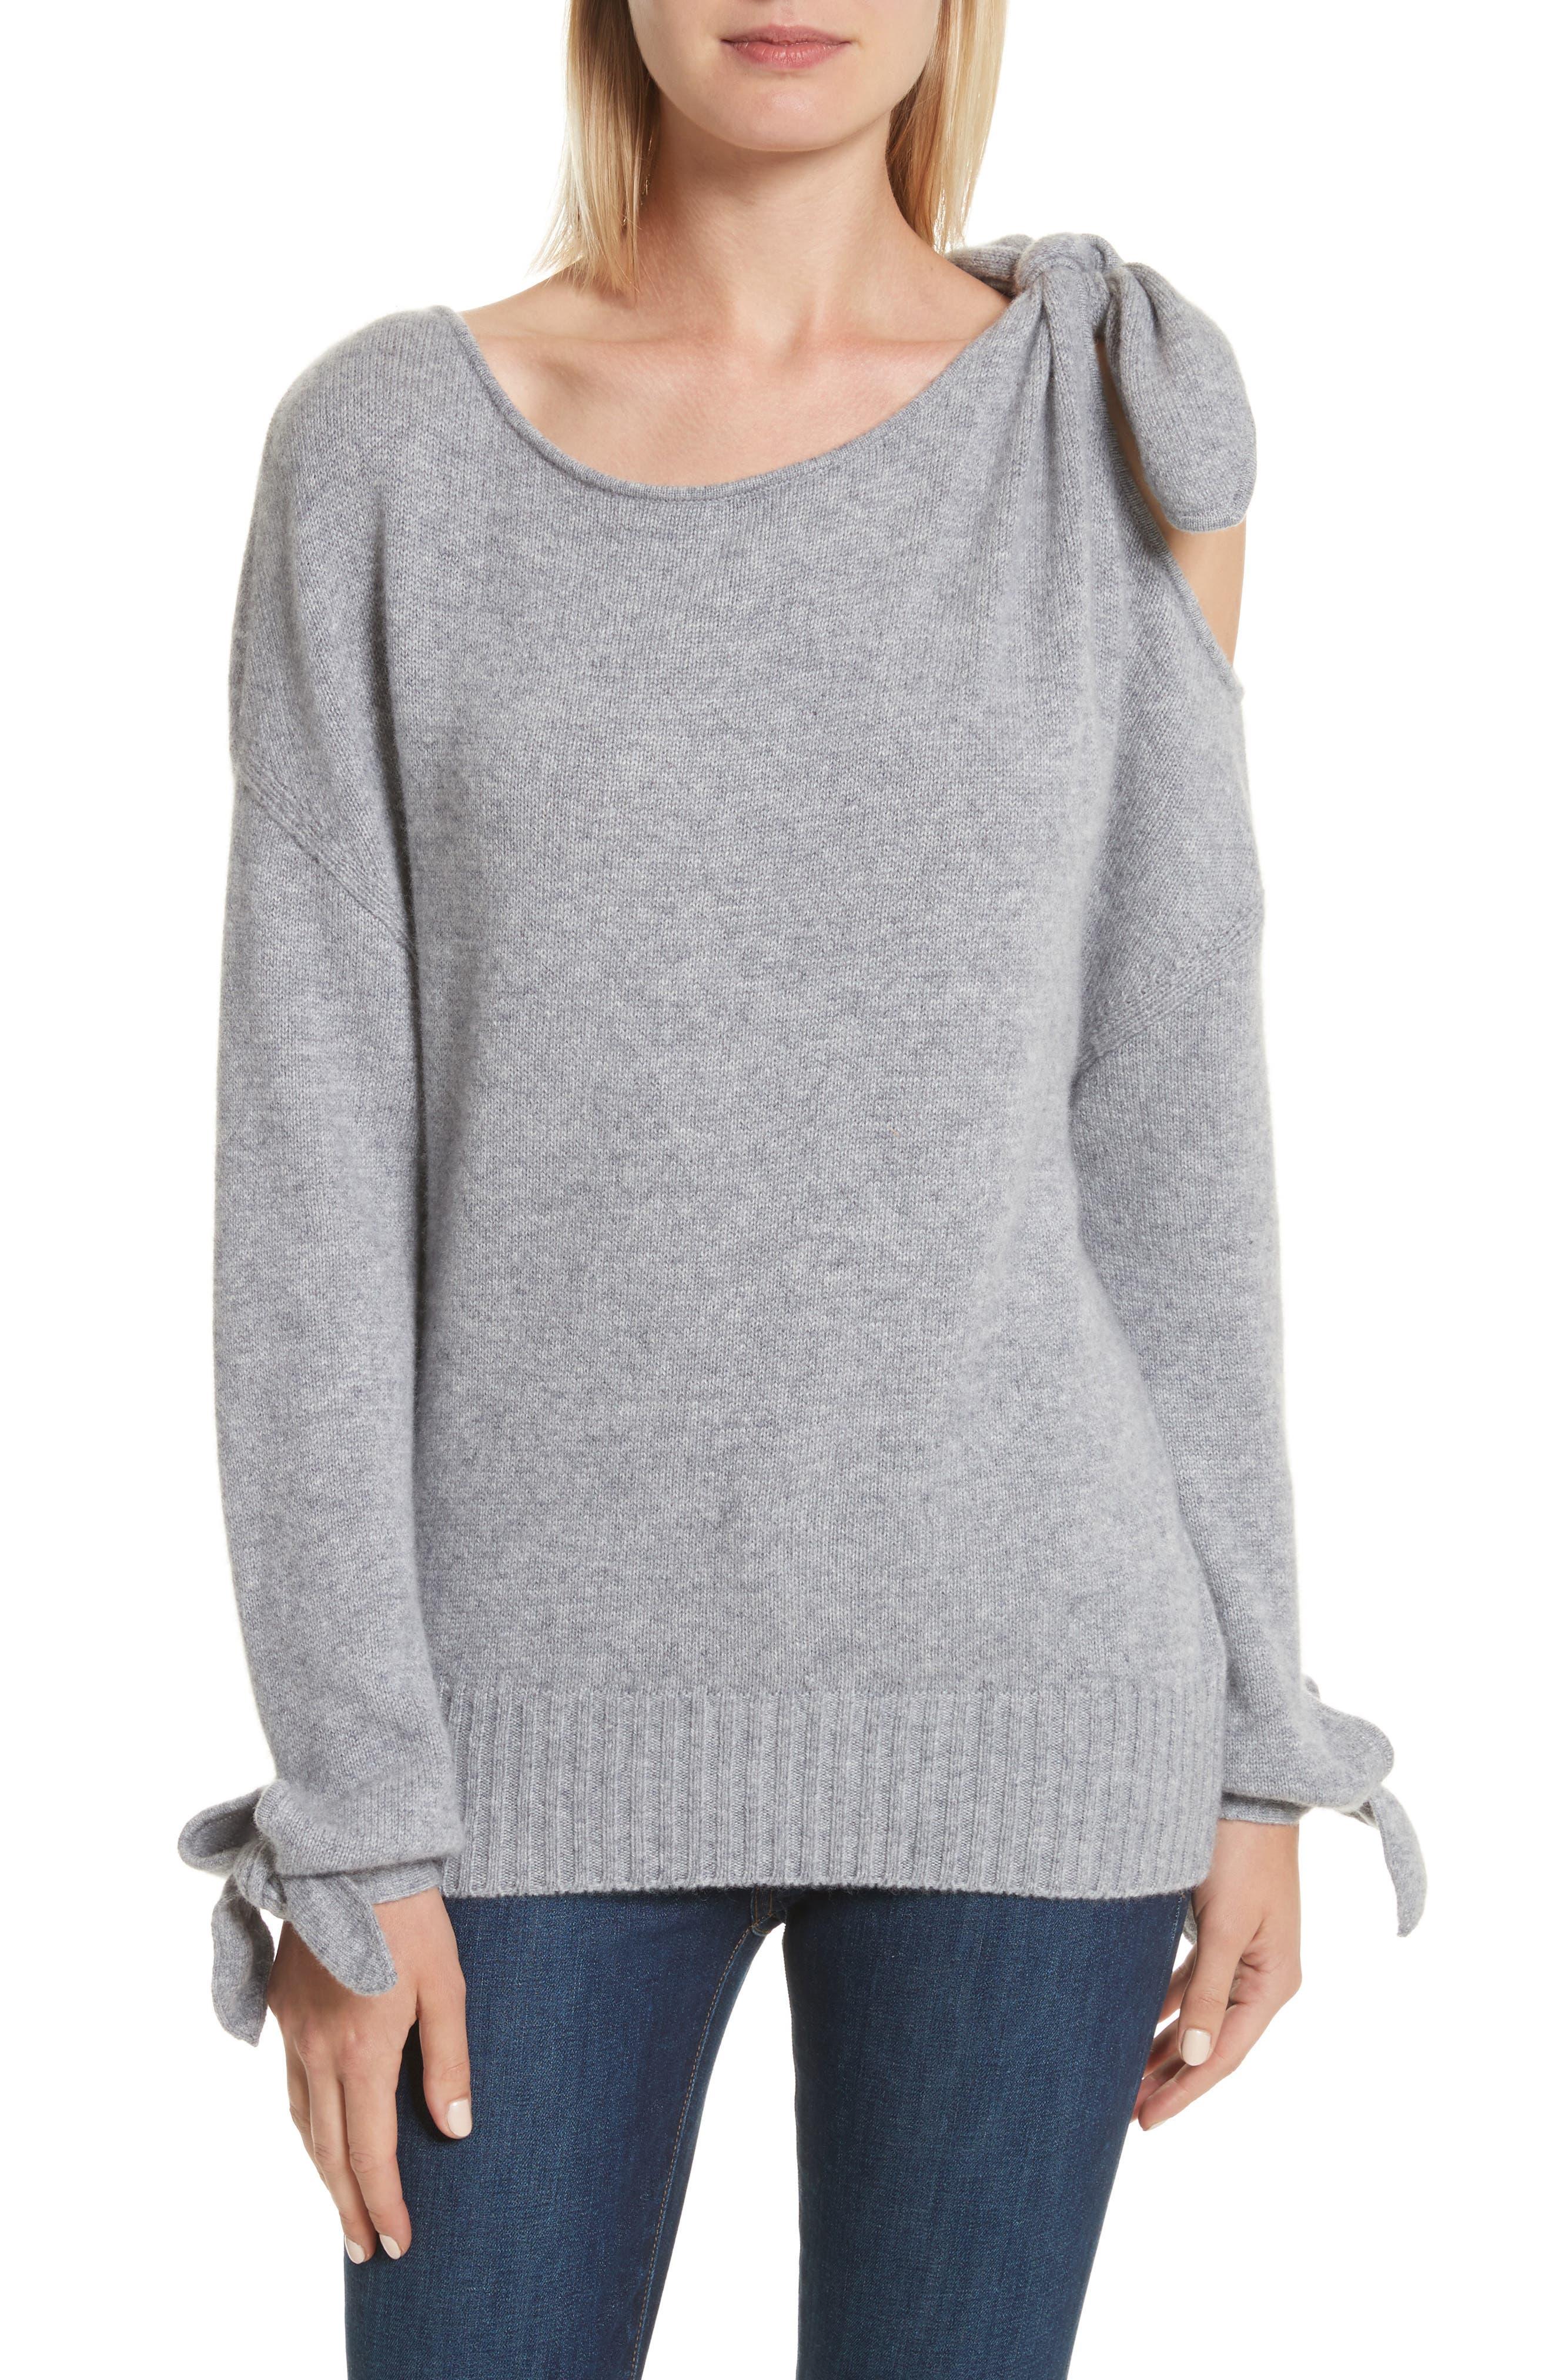 Alternate Image 1 Selected - Derek Lam 10 Crosby Tie Detail Cashmere Sweater